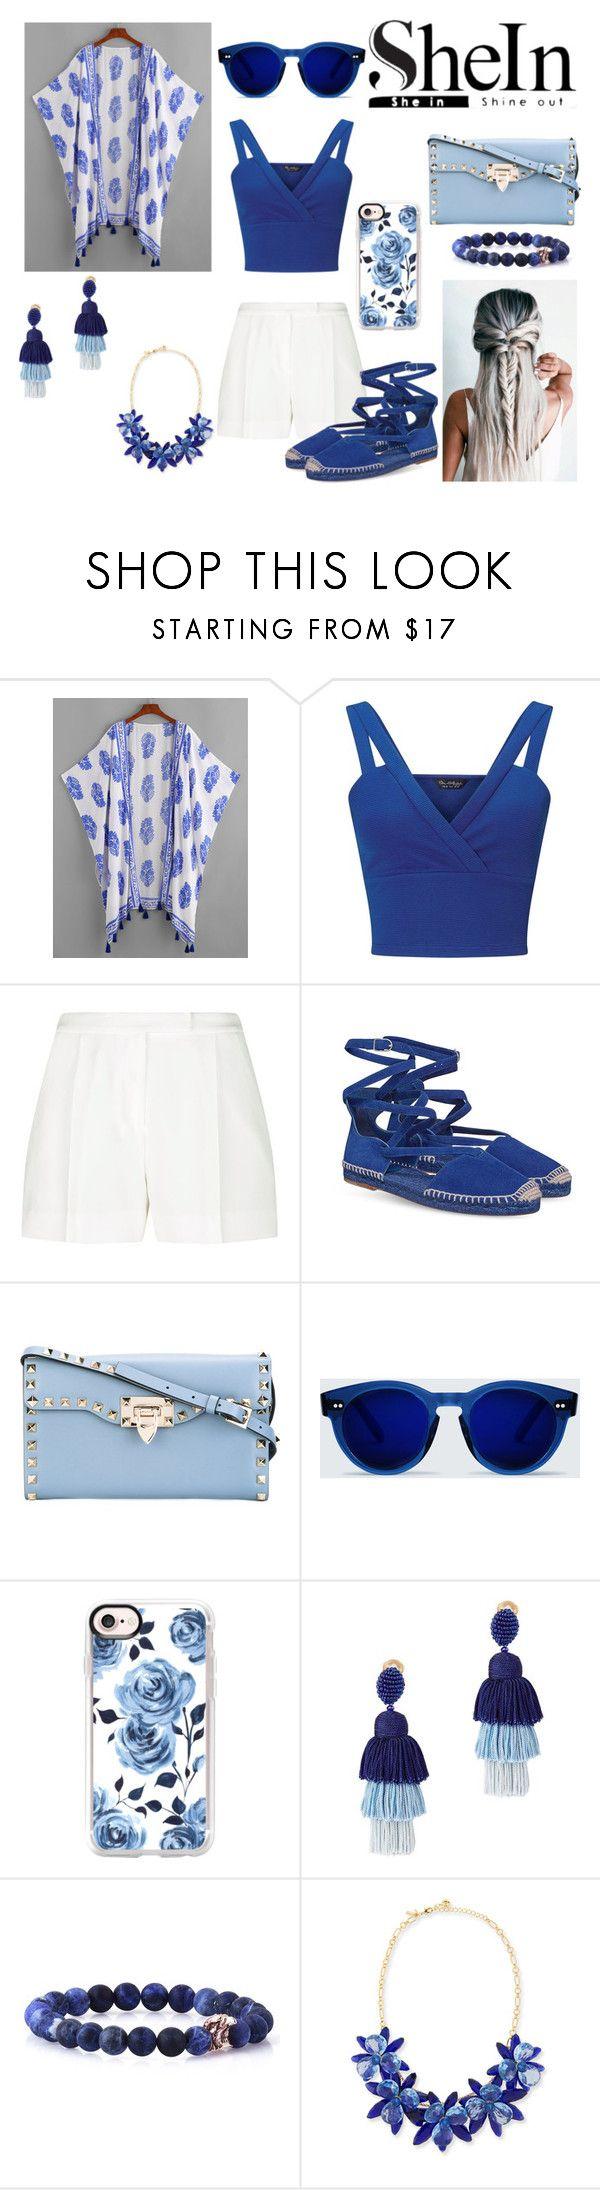 """bleu ocean"" by sarashic-7 ❤ liked on Polyvore featuring Miss Selfridge, Elie Saab, Valentino, Casetify, Oscar de la Renta and Kate Spade"